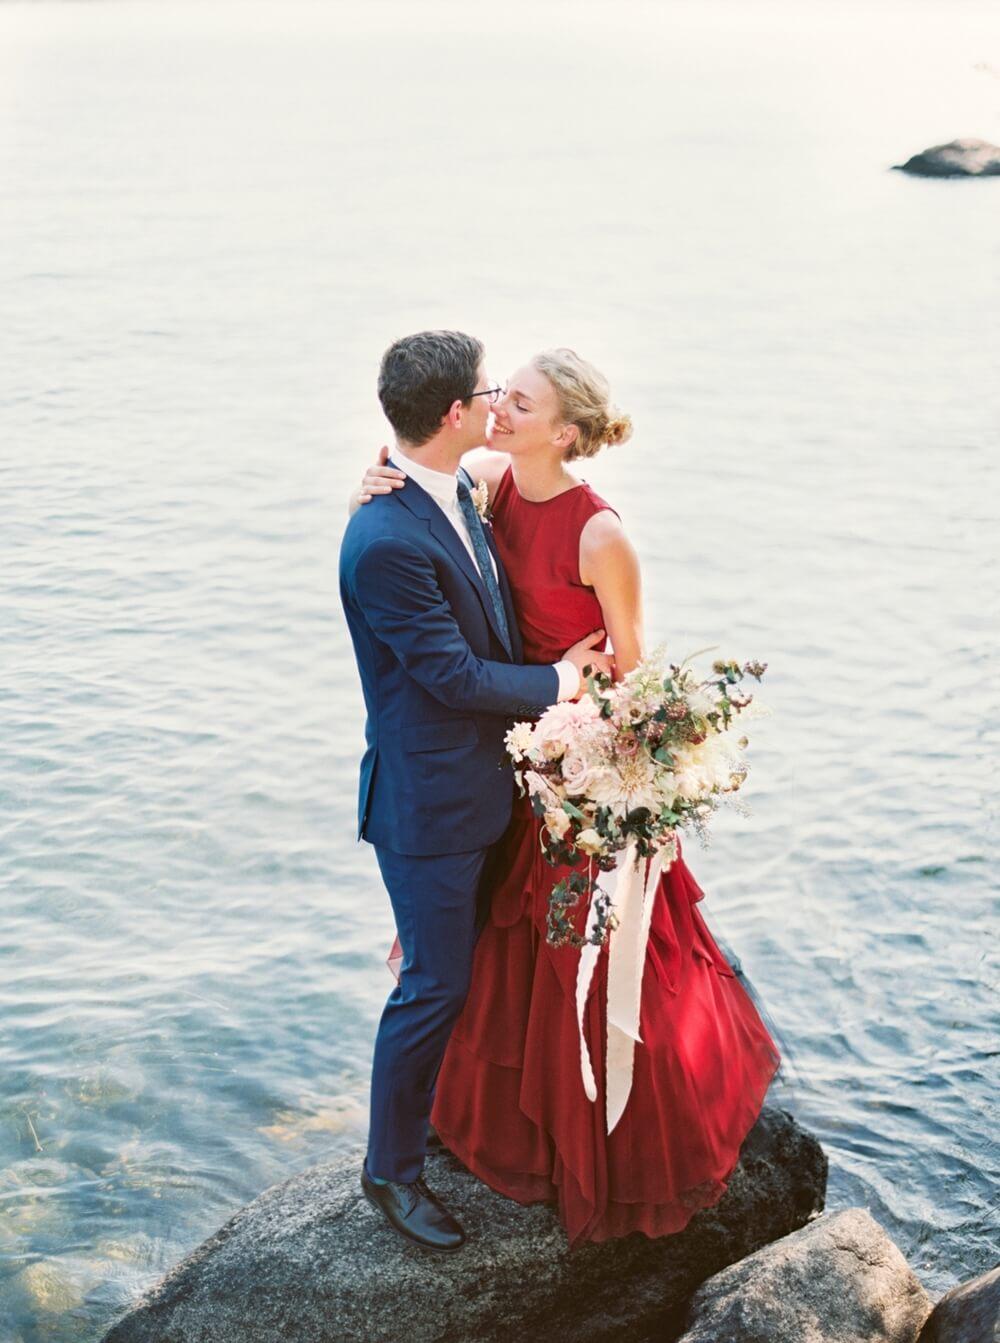 Bridal_Wedding_Imagery_26.jpg